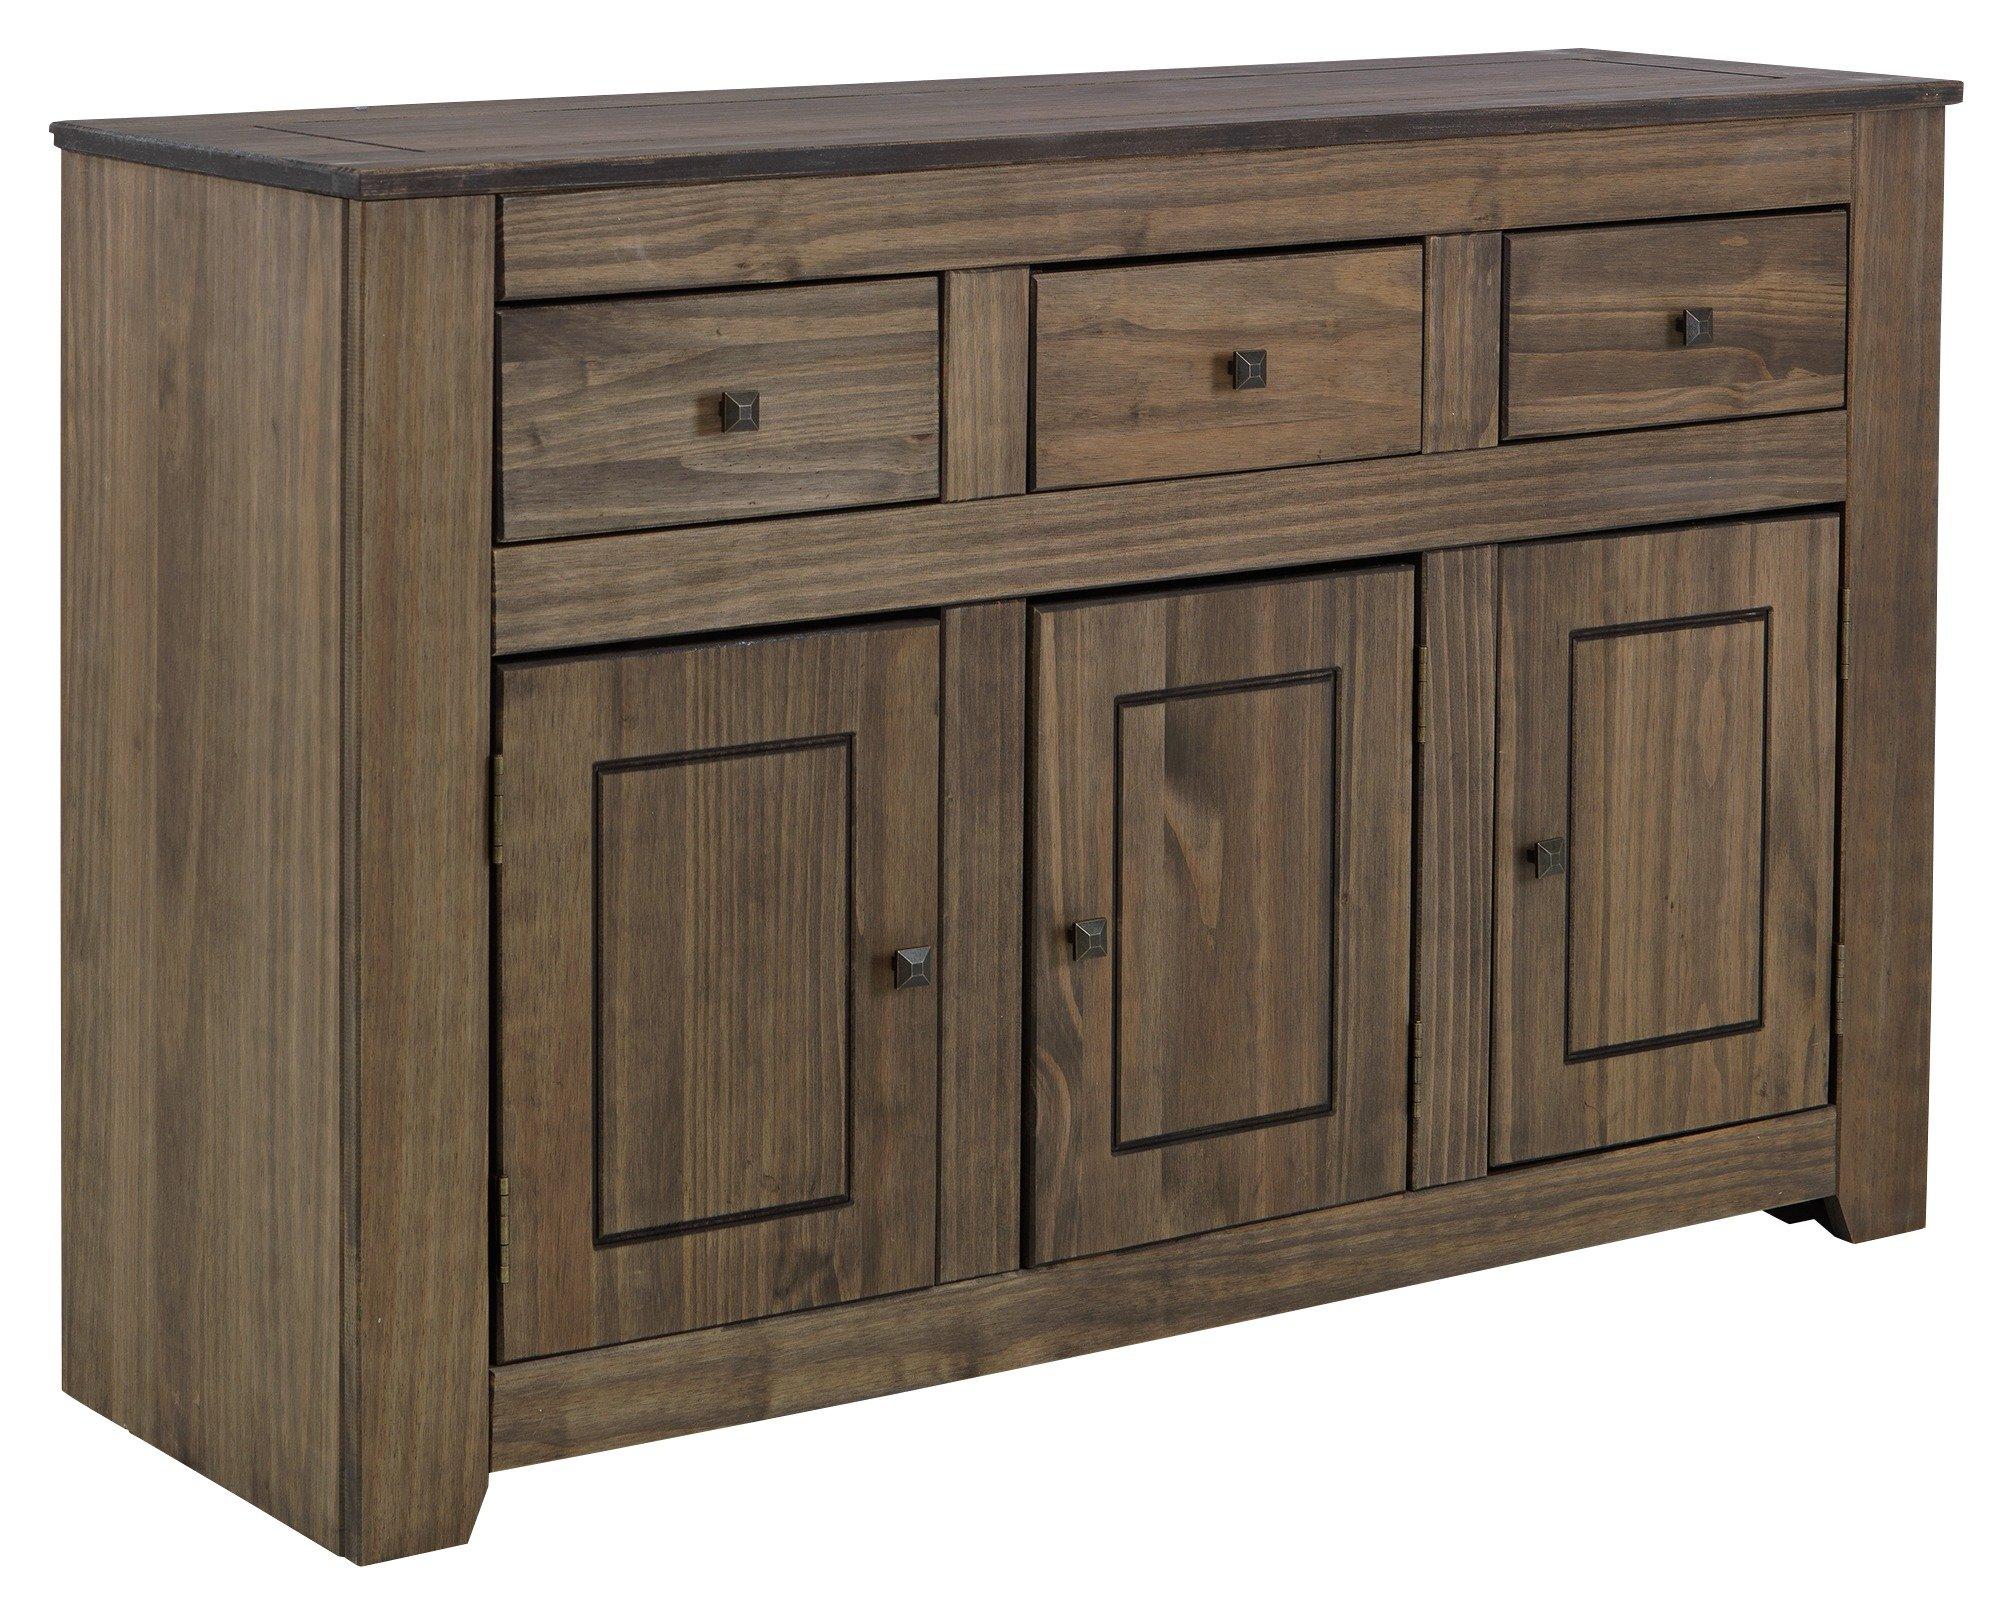 Argos Home Amersham Large Solid Wood Sideboard - Dark Pine